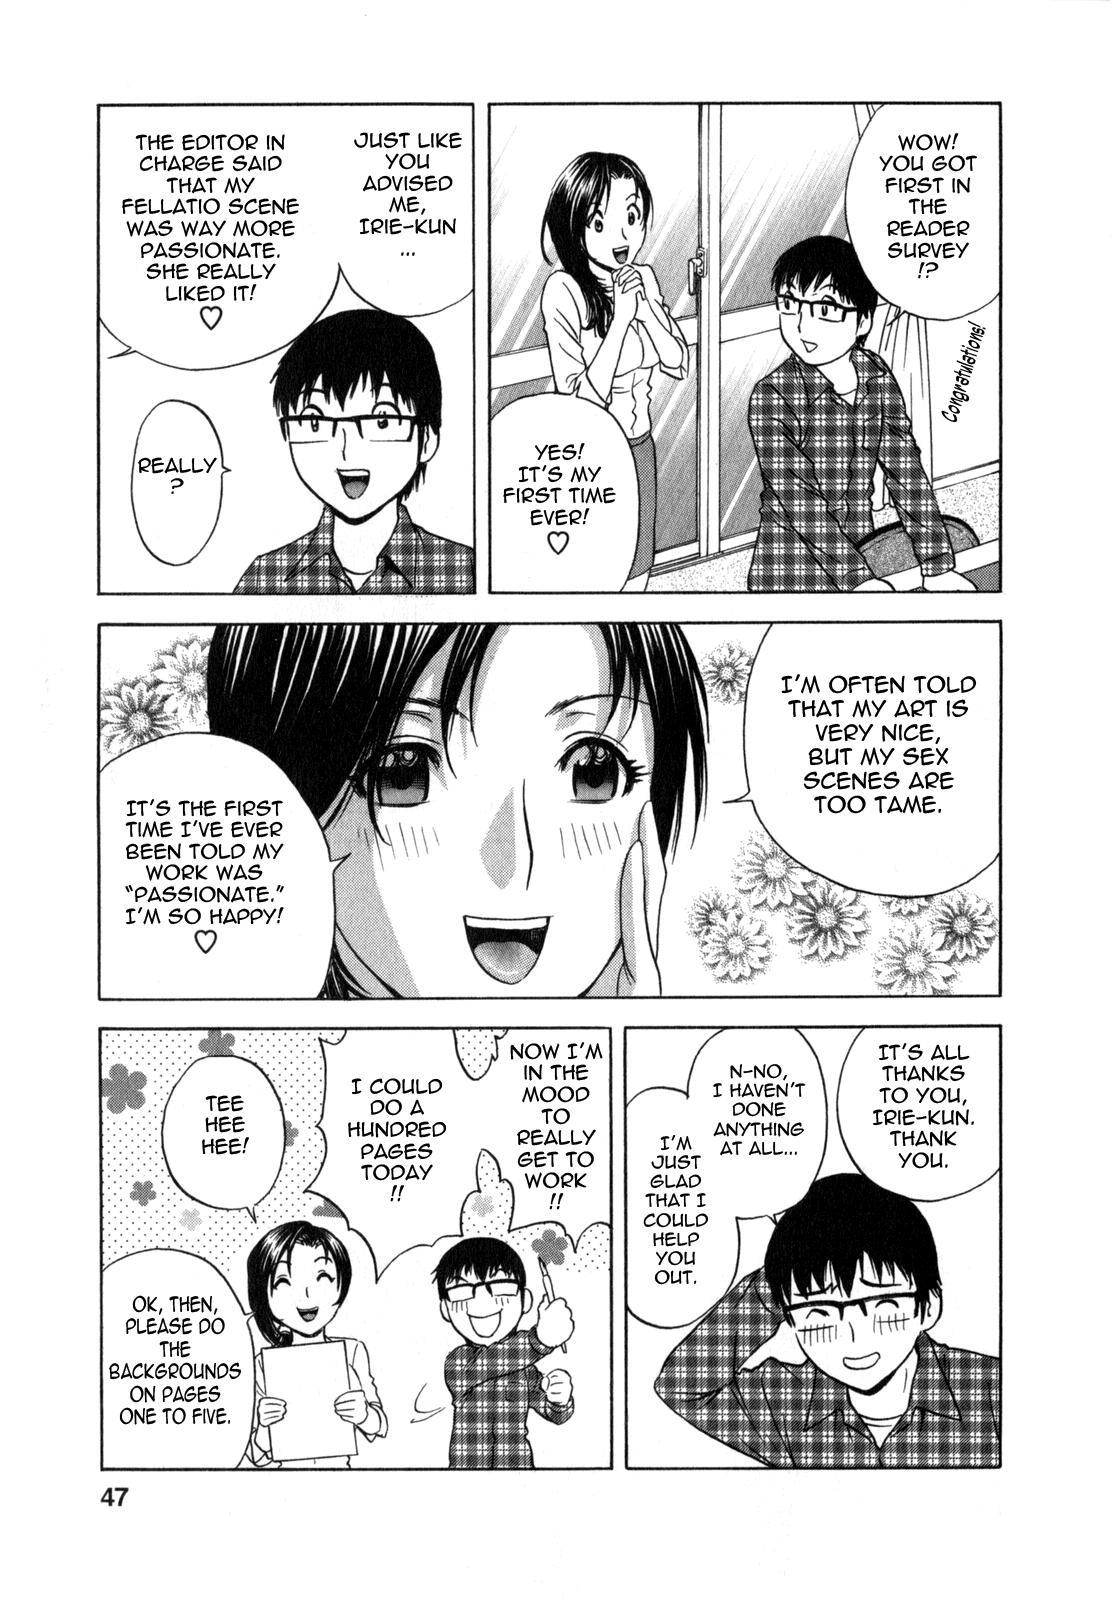 [Hidemaru] Life with Married Women Just Like a Manga 1 - Ch. 1-3 [English] {Tadanohito} 49